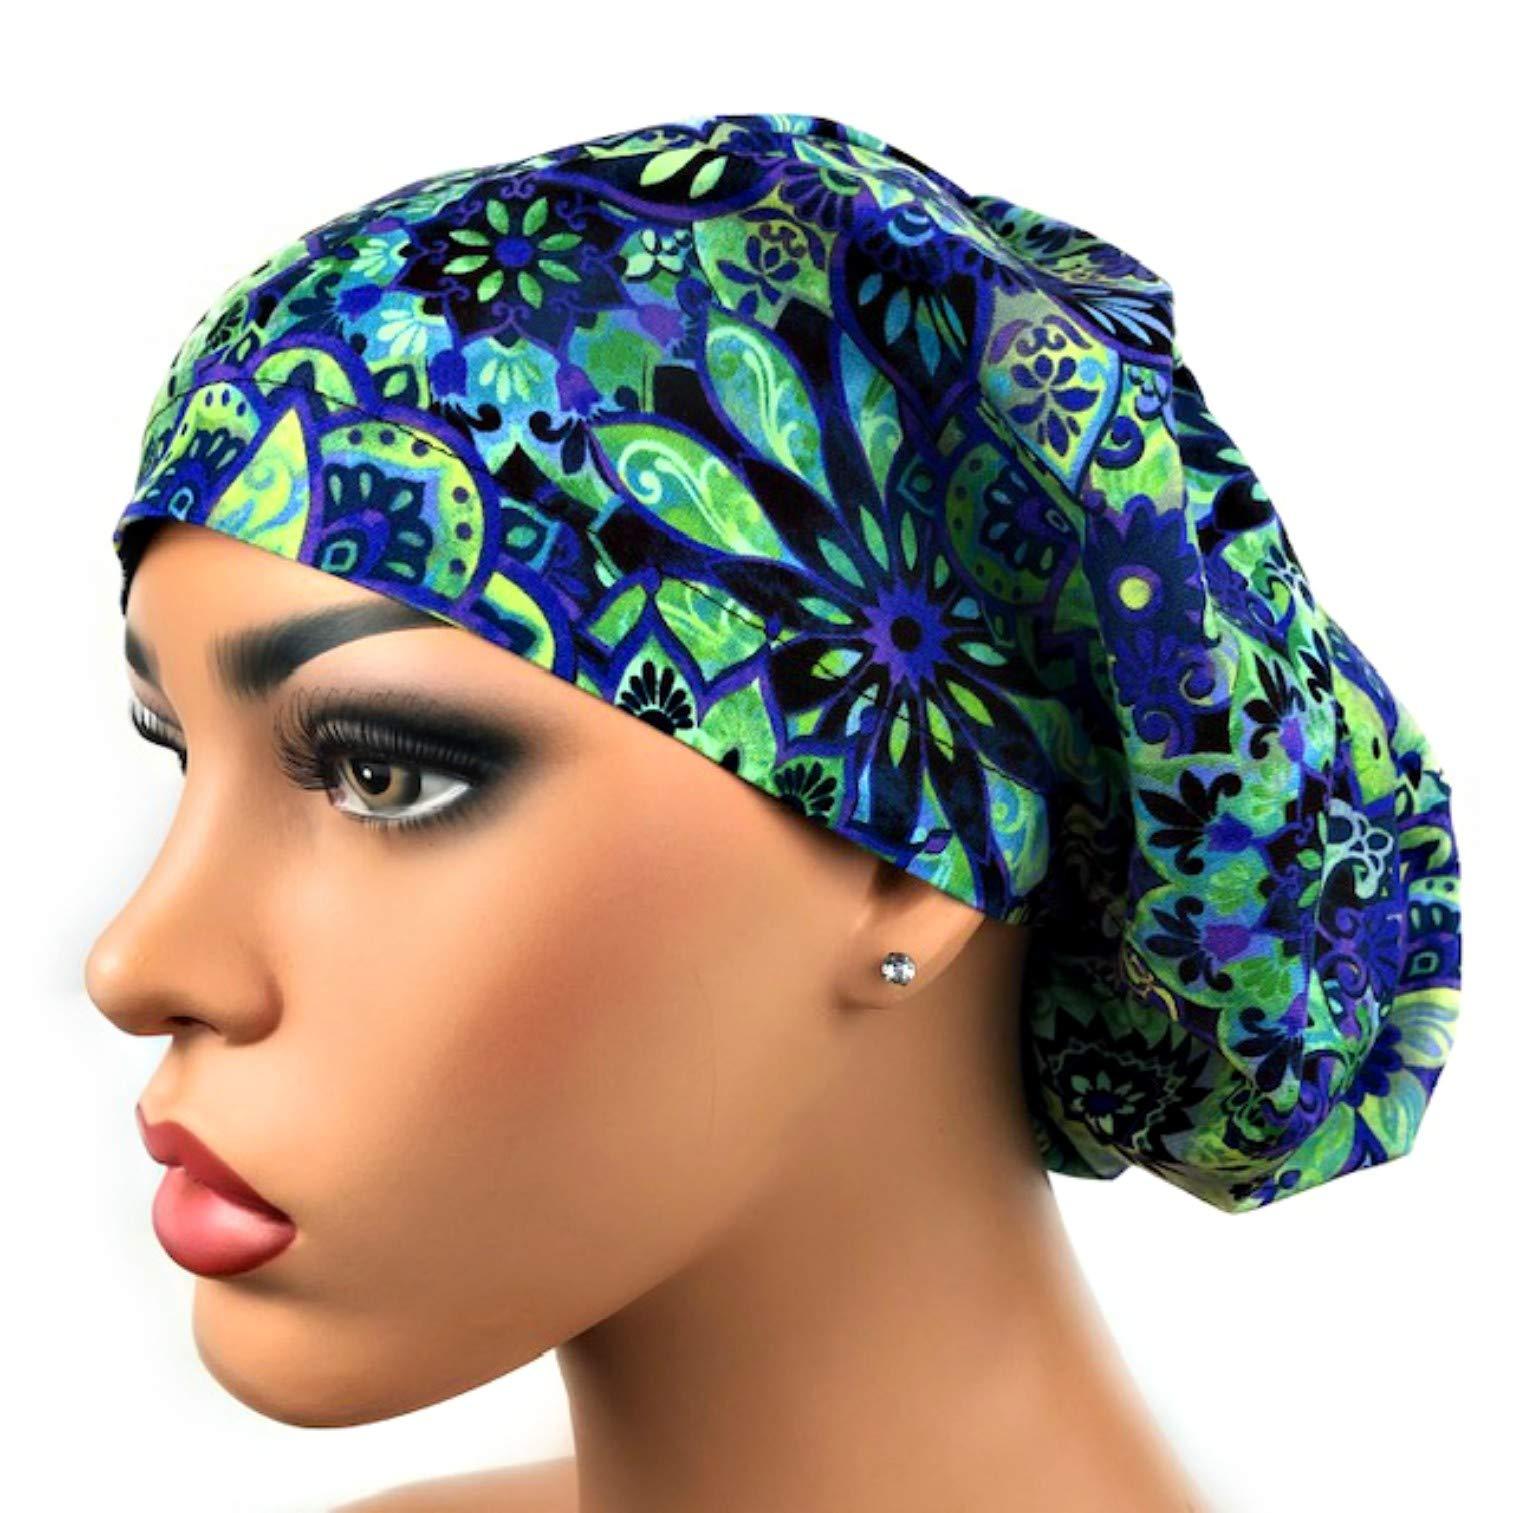 Womens Surgical Scrub Hat OR Nurse Cap Euro Style Purple, Blue, Green Floral Print Bouffant Cap by DK Scrub Hats